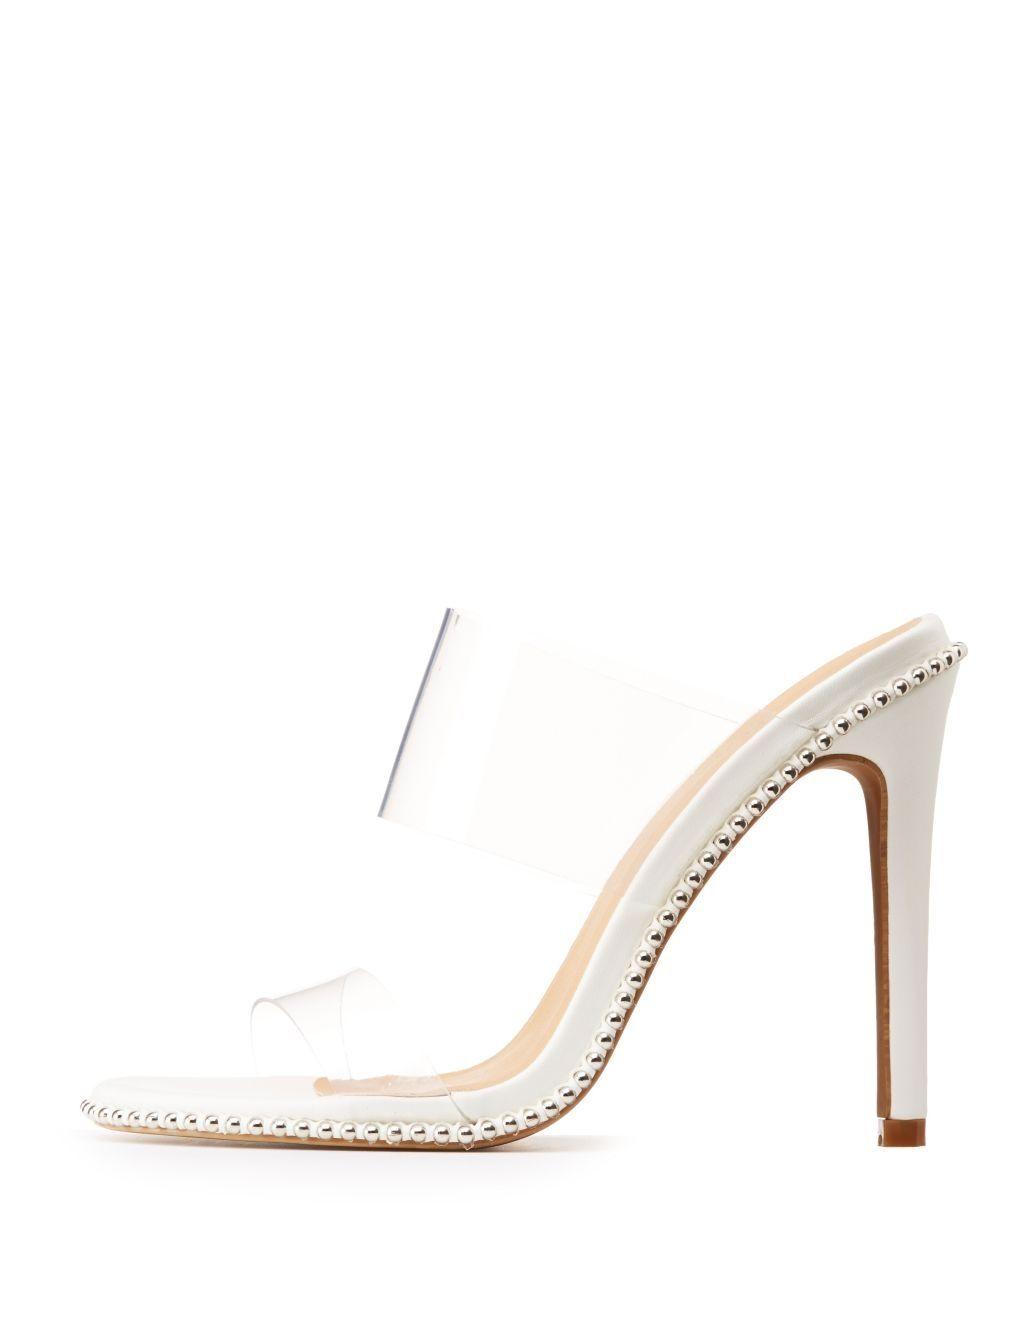 724b0eb3f7 Charlotte Russe Clear Open Toe Mules | Shoes | kanbkam.com